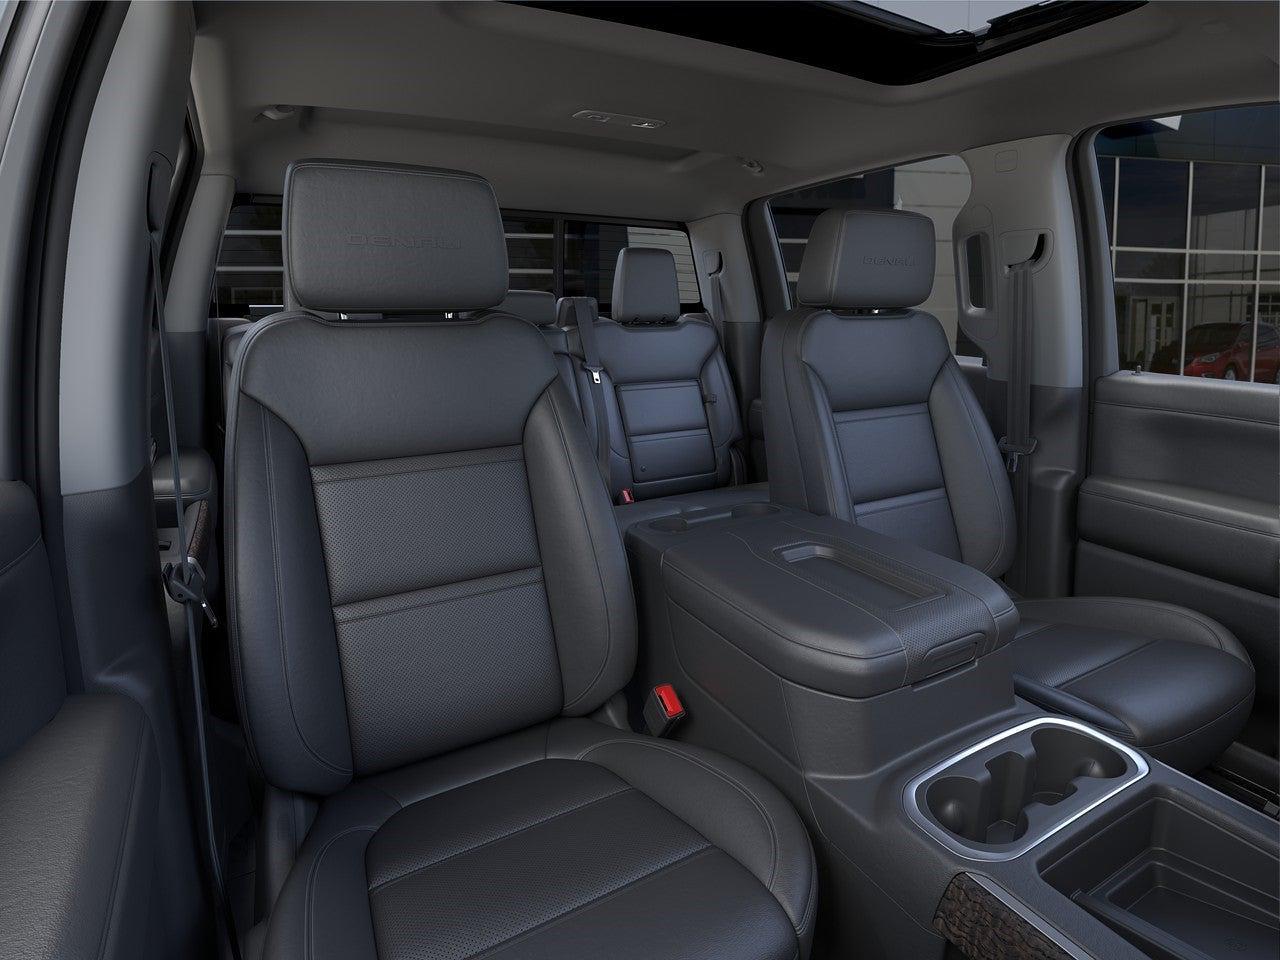 2021 GMC Sierra 1500 Crew Cab 4x4, Pickup #V21153 - photo 13